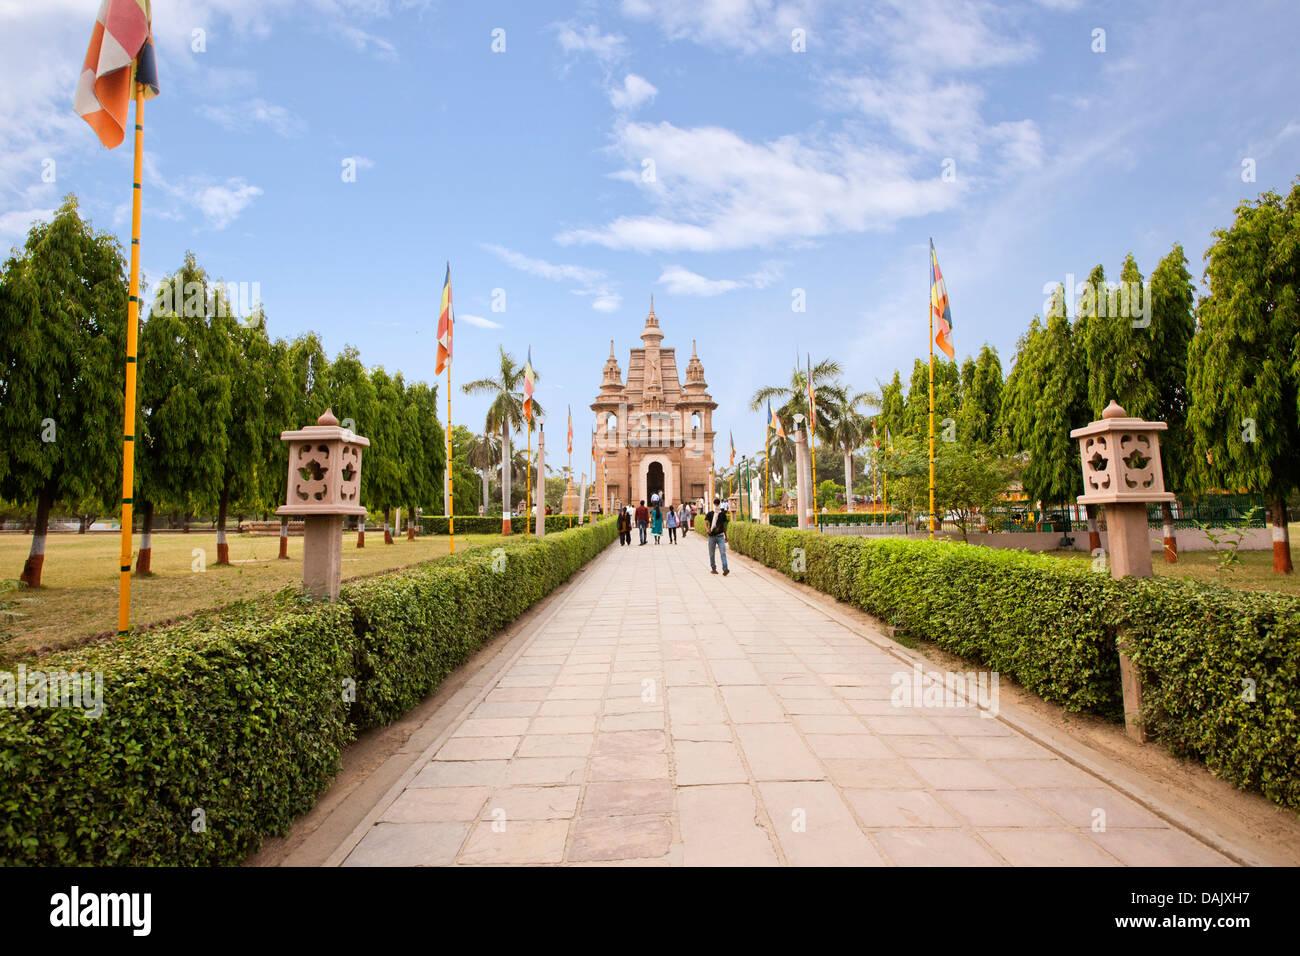 Garden path leading to a temple, Mulagandha Kuti Vihar Temple, Sarnath, Varanasi, Uttar Pradesh, India - Stock Image